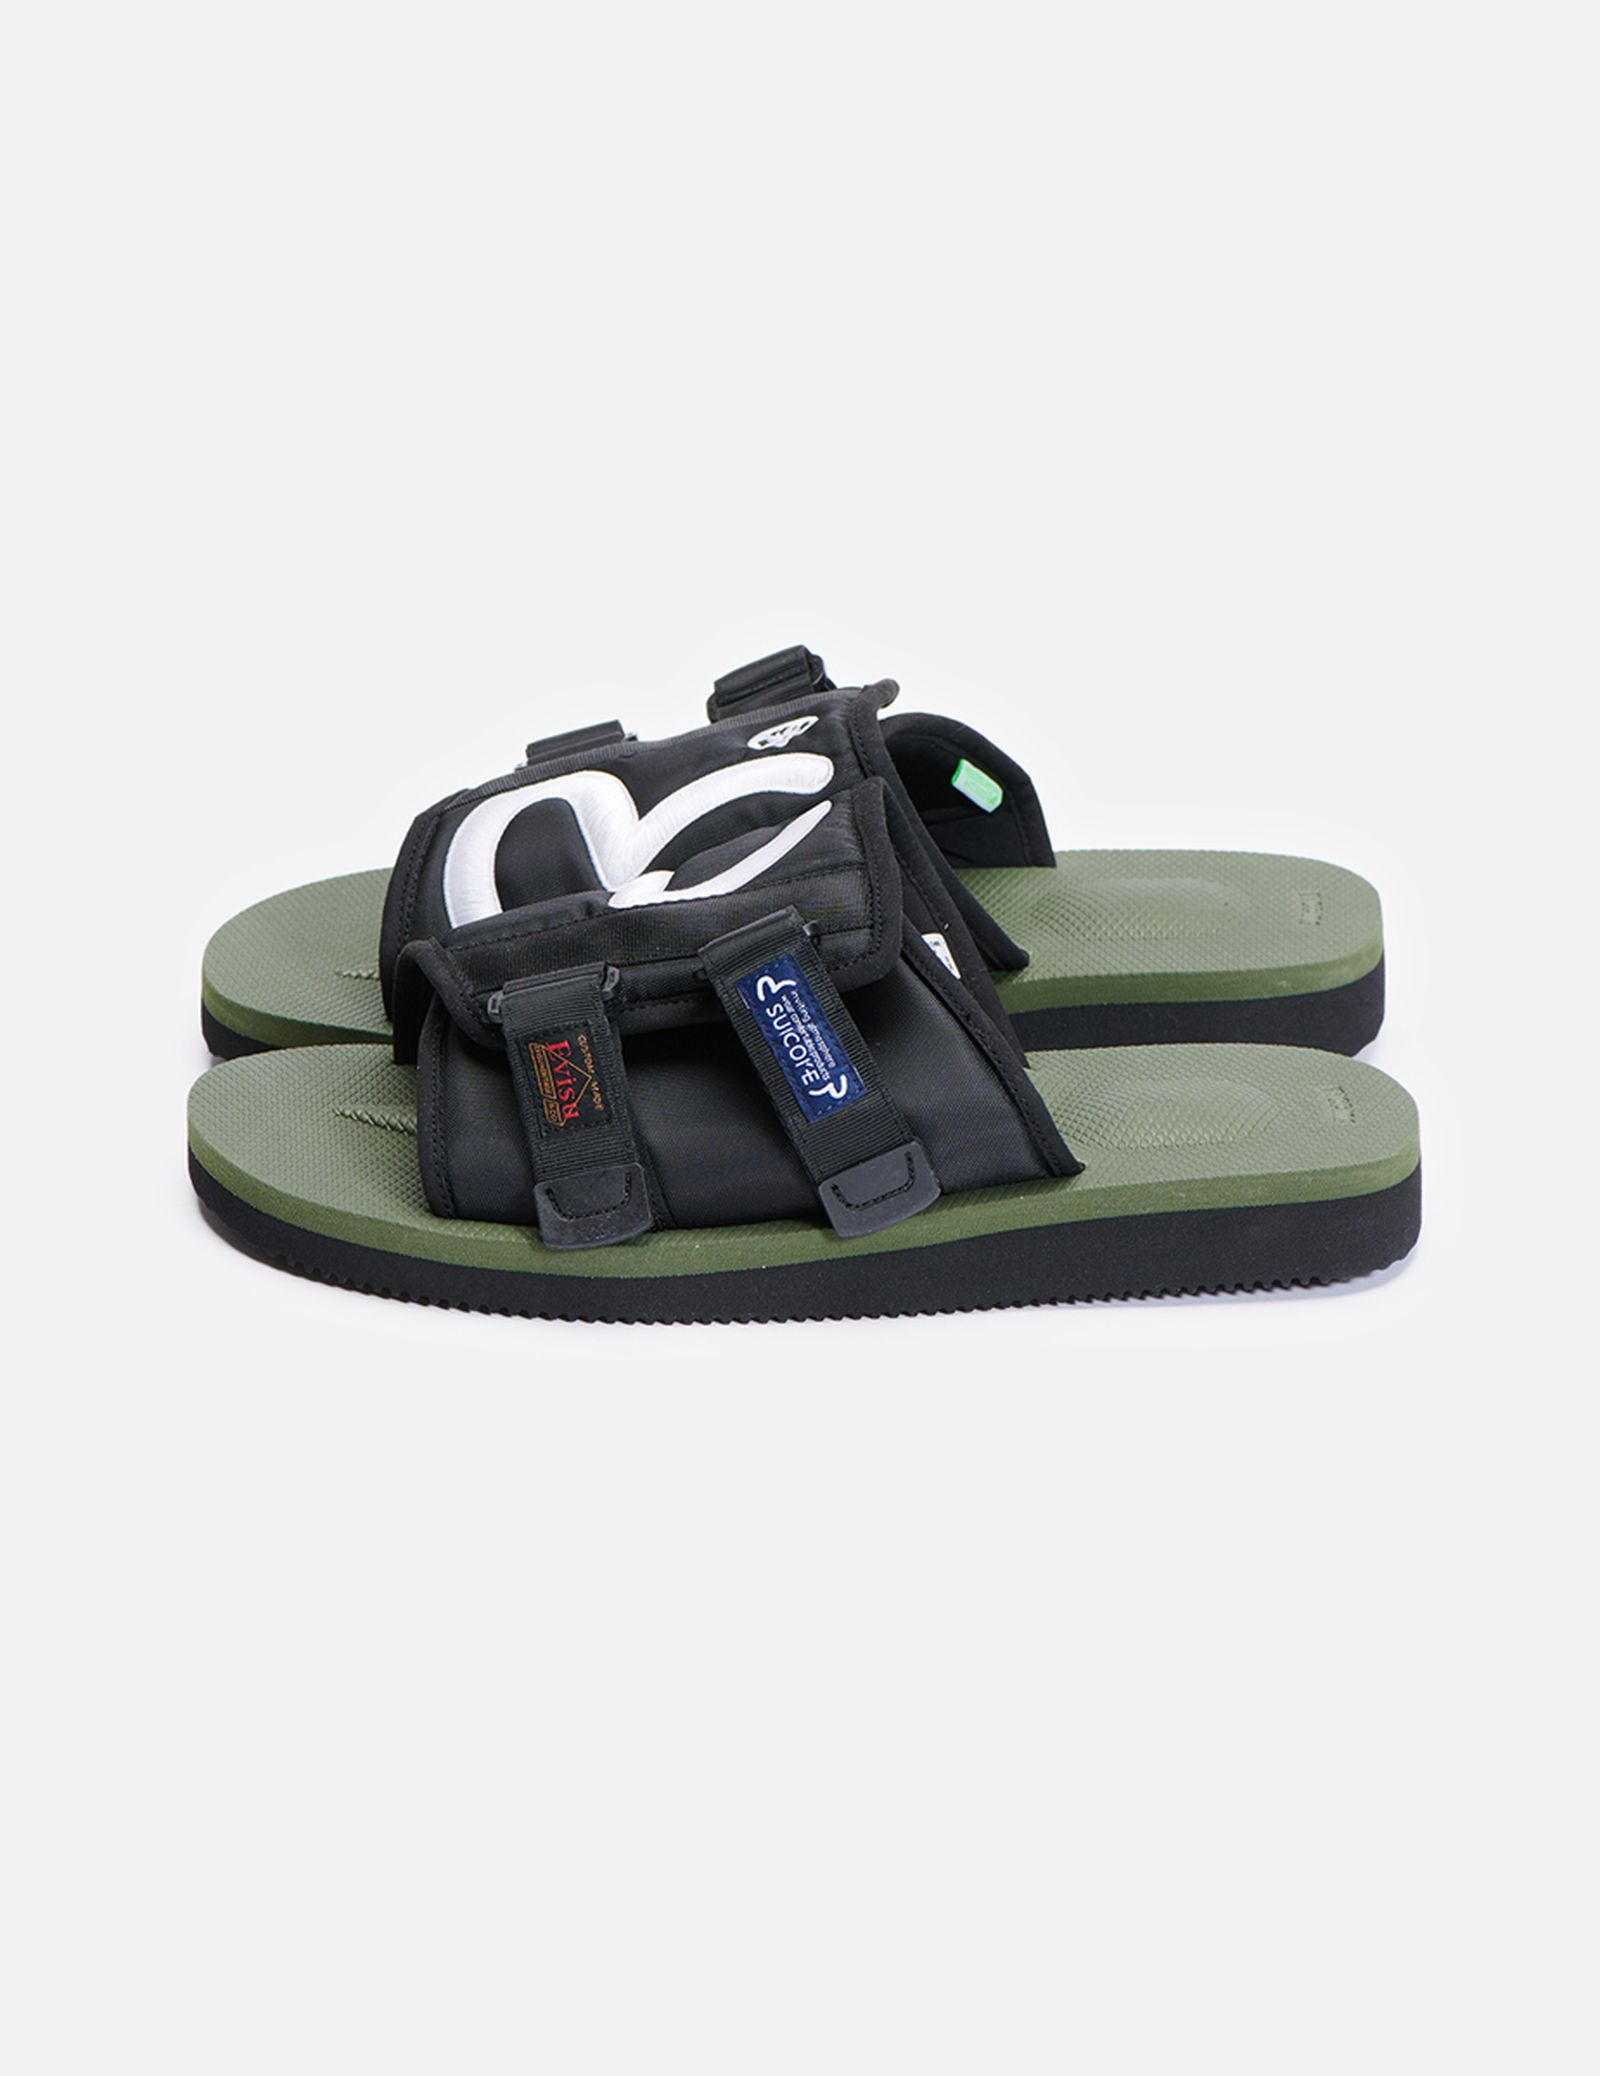 evisu-suicoke-denim-kaw-sandal-collab- (7)